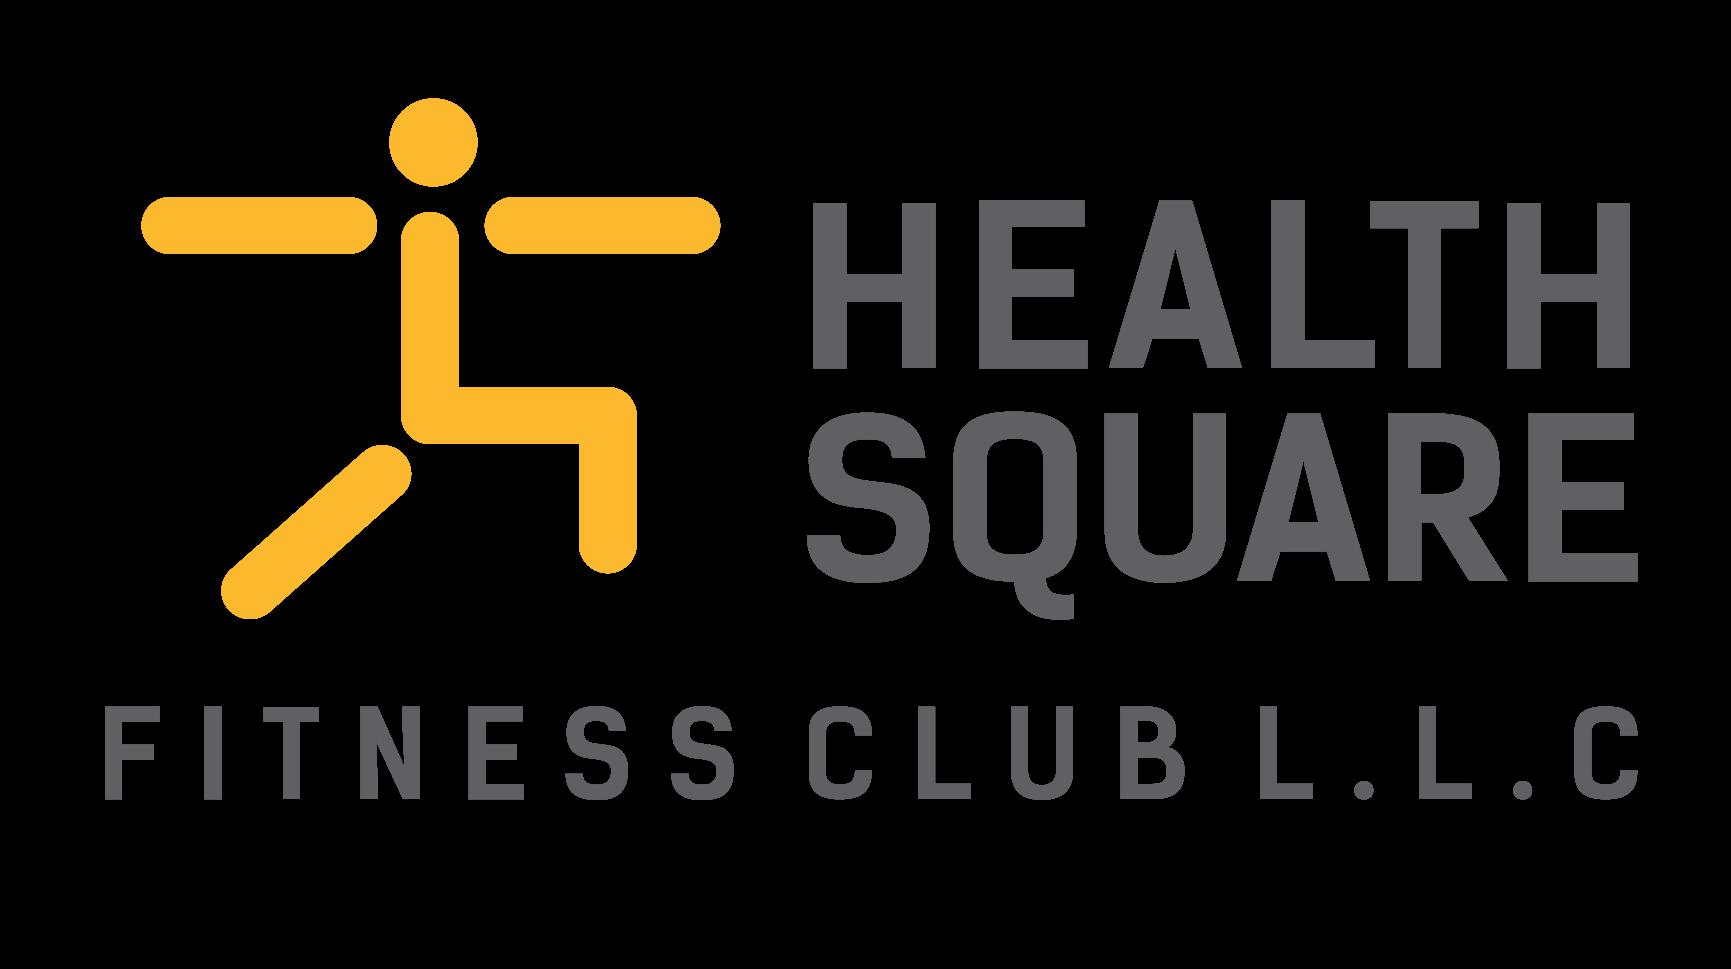 Health Square Fitness Club - HSFC